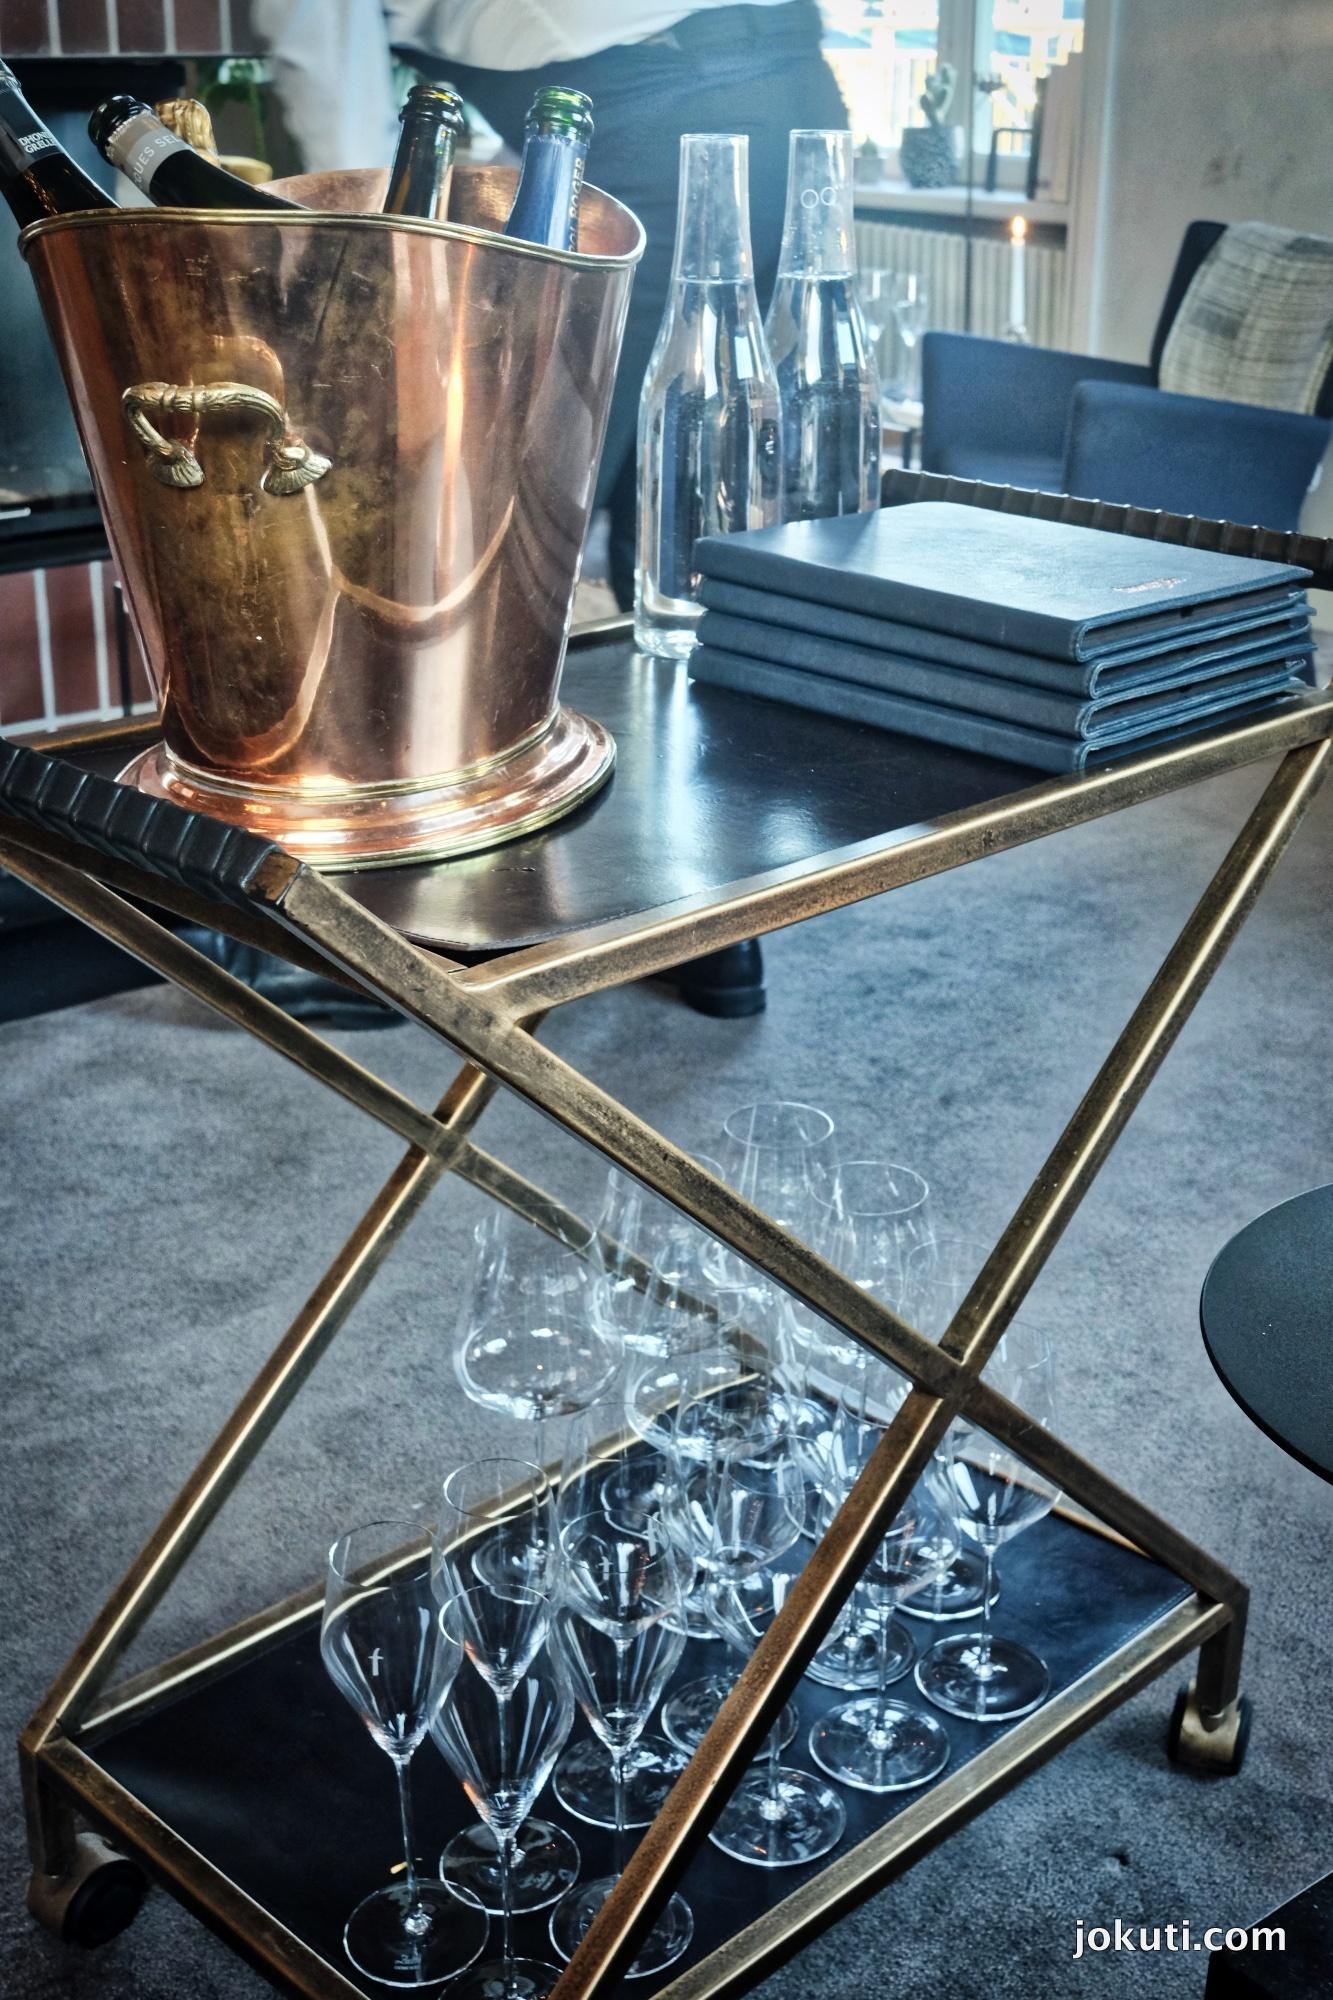 dscf5356_frantzen_stockholm_restaurant_michelin_stars_sweden_vilagevo_jokuti_l.jpg